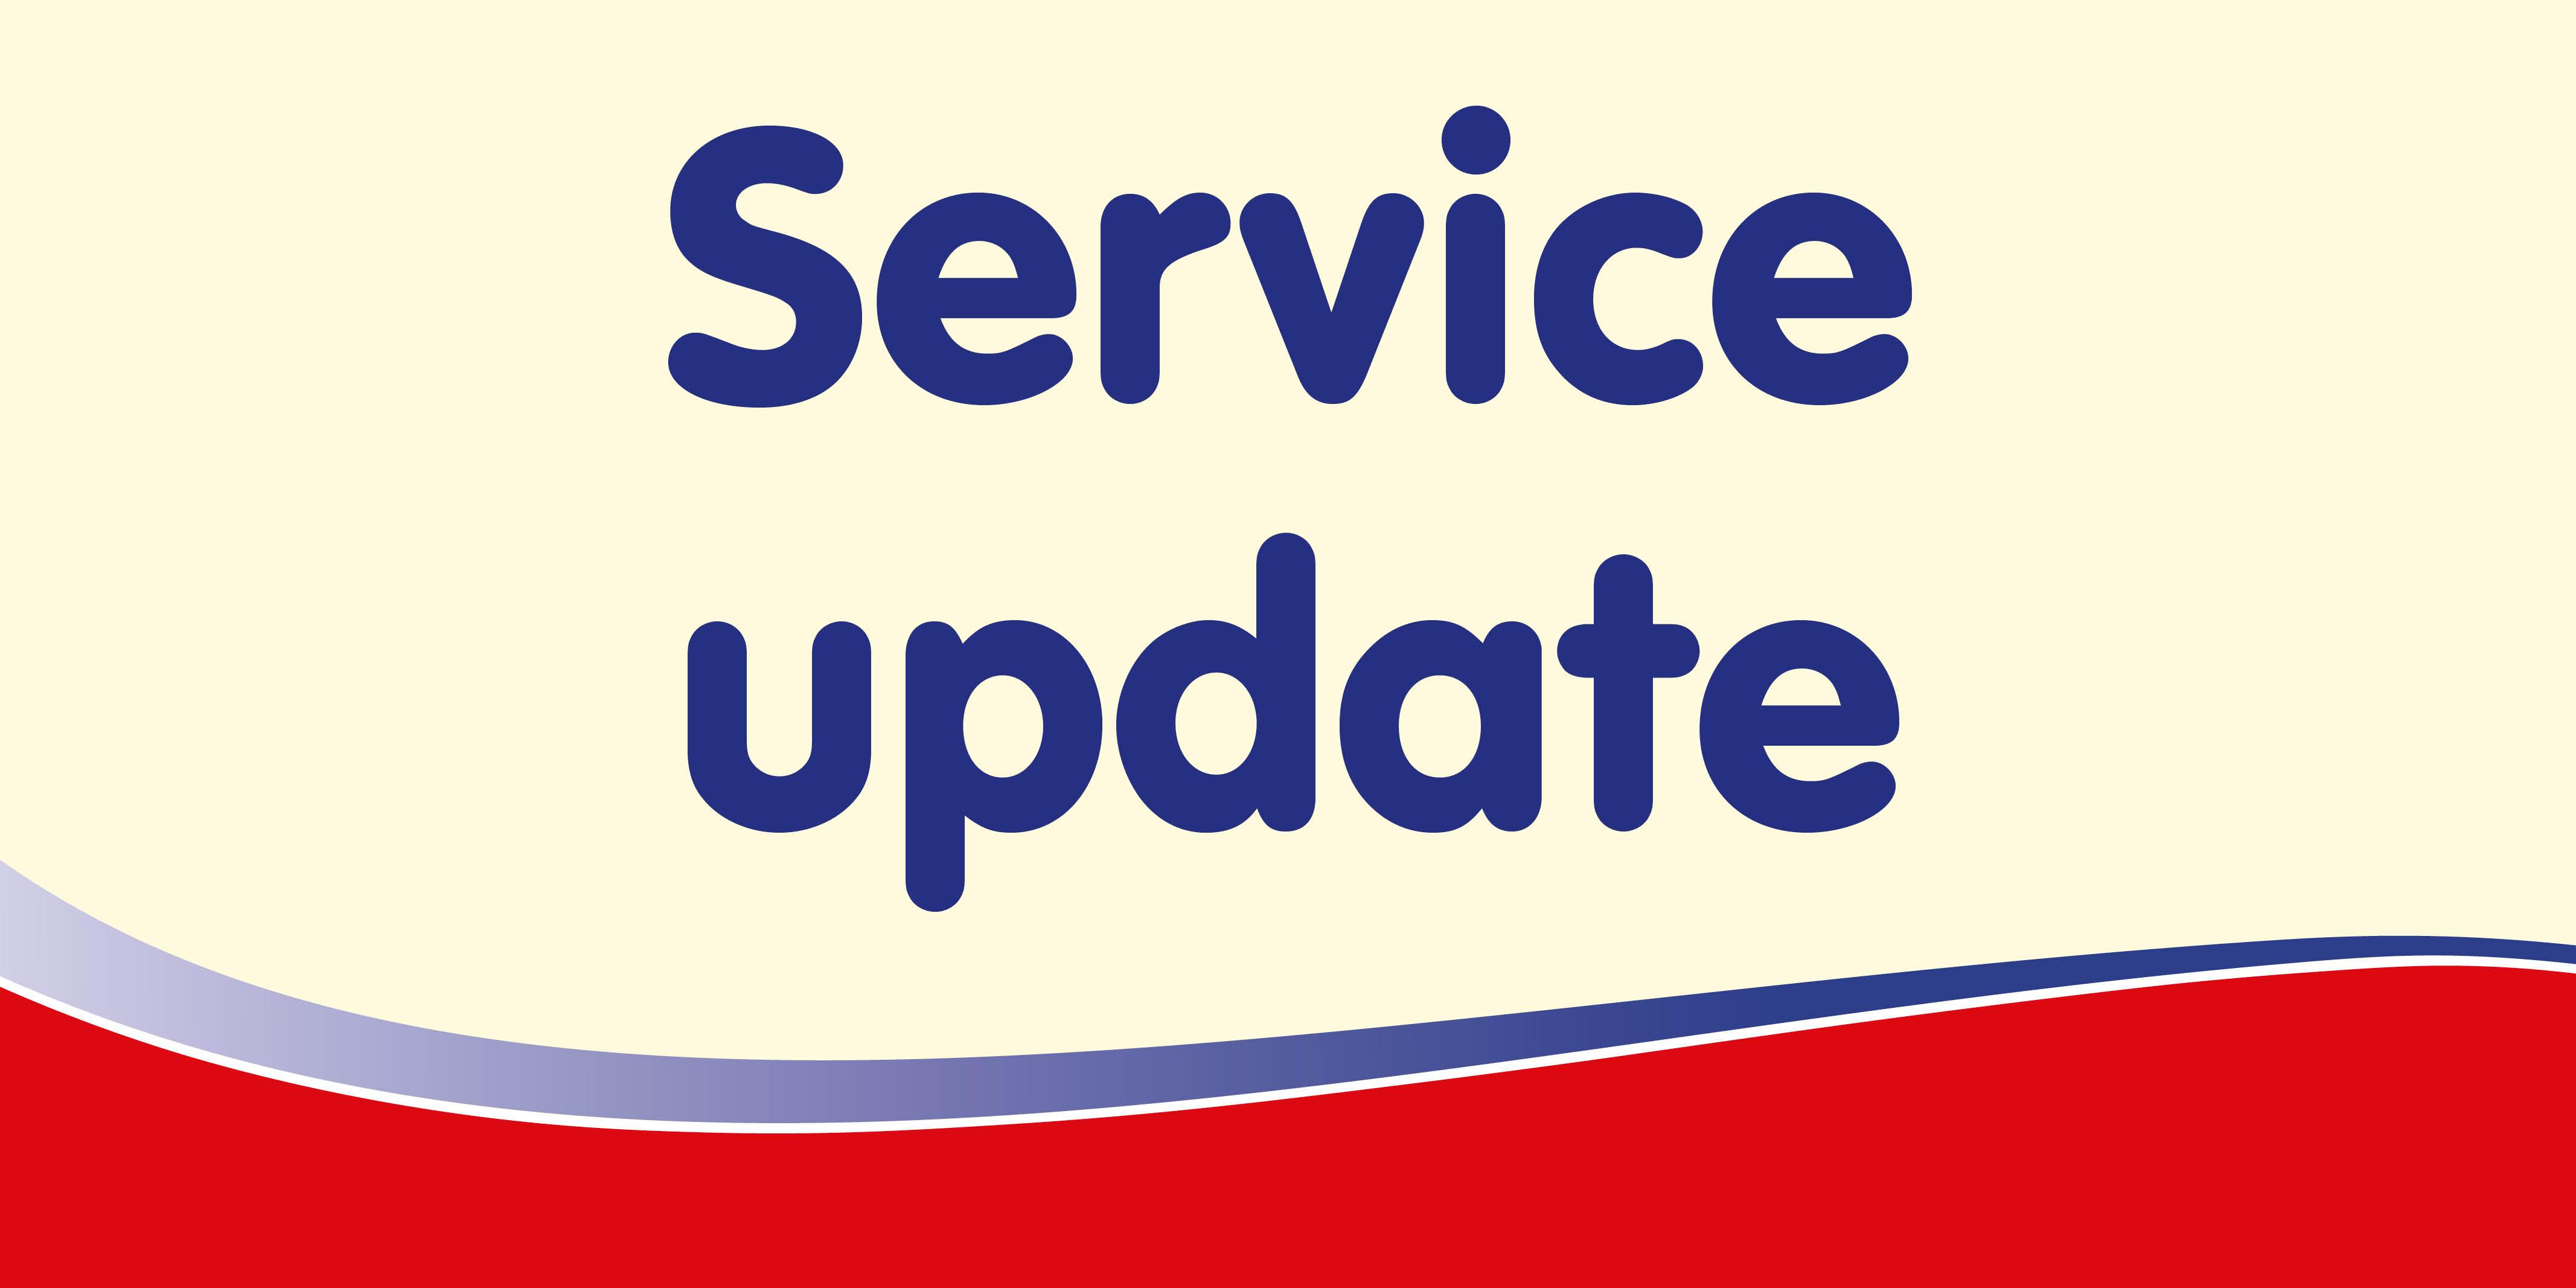 cream graphic reading service update